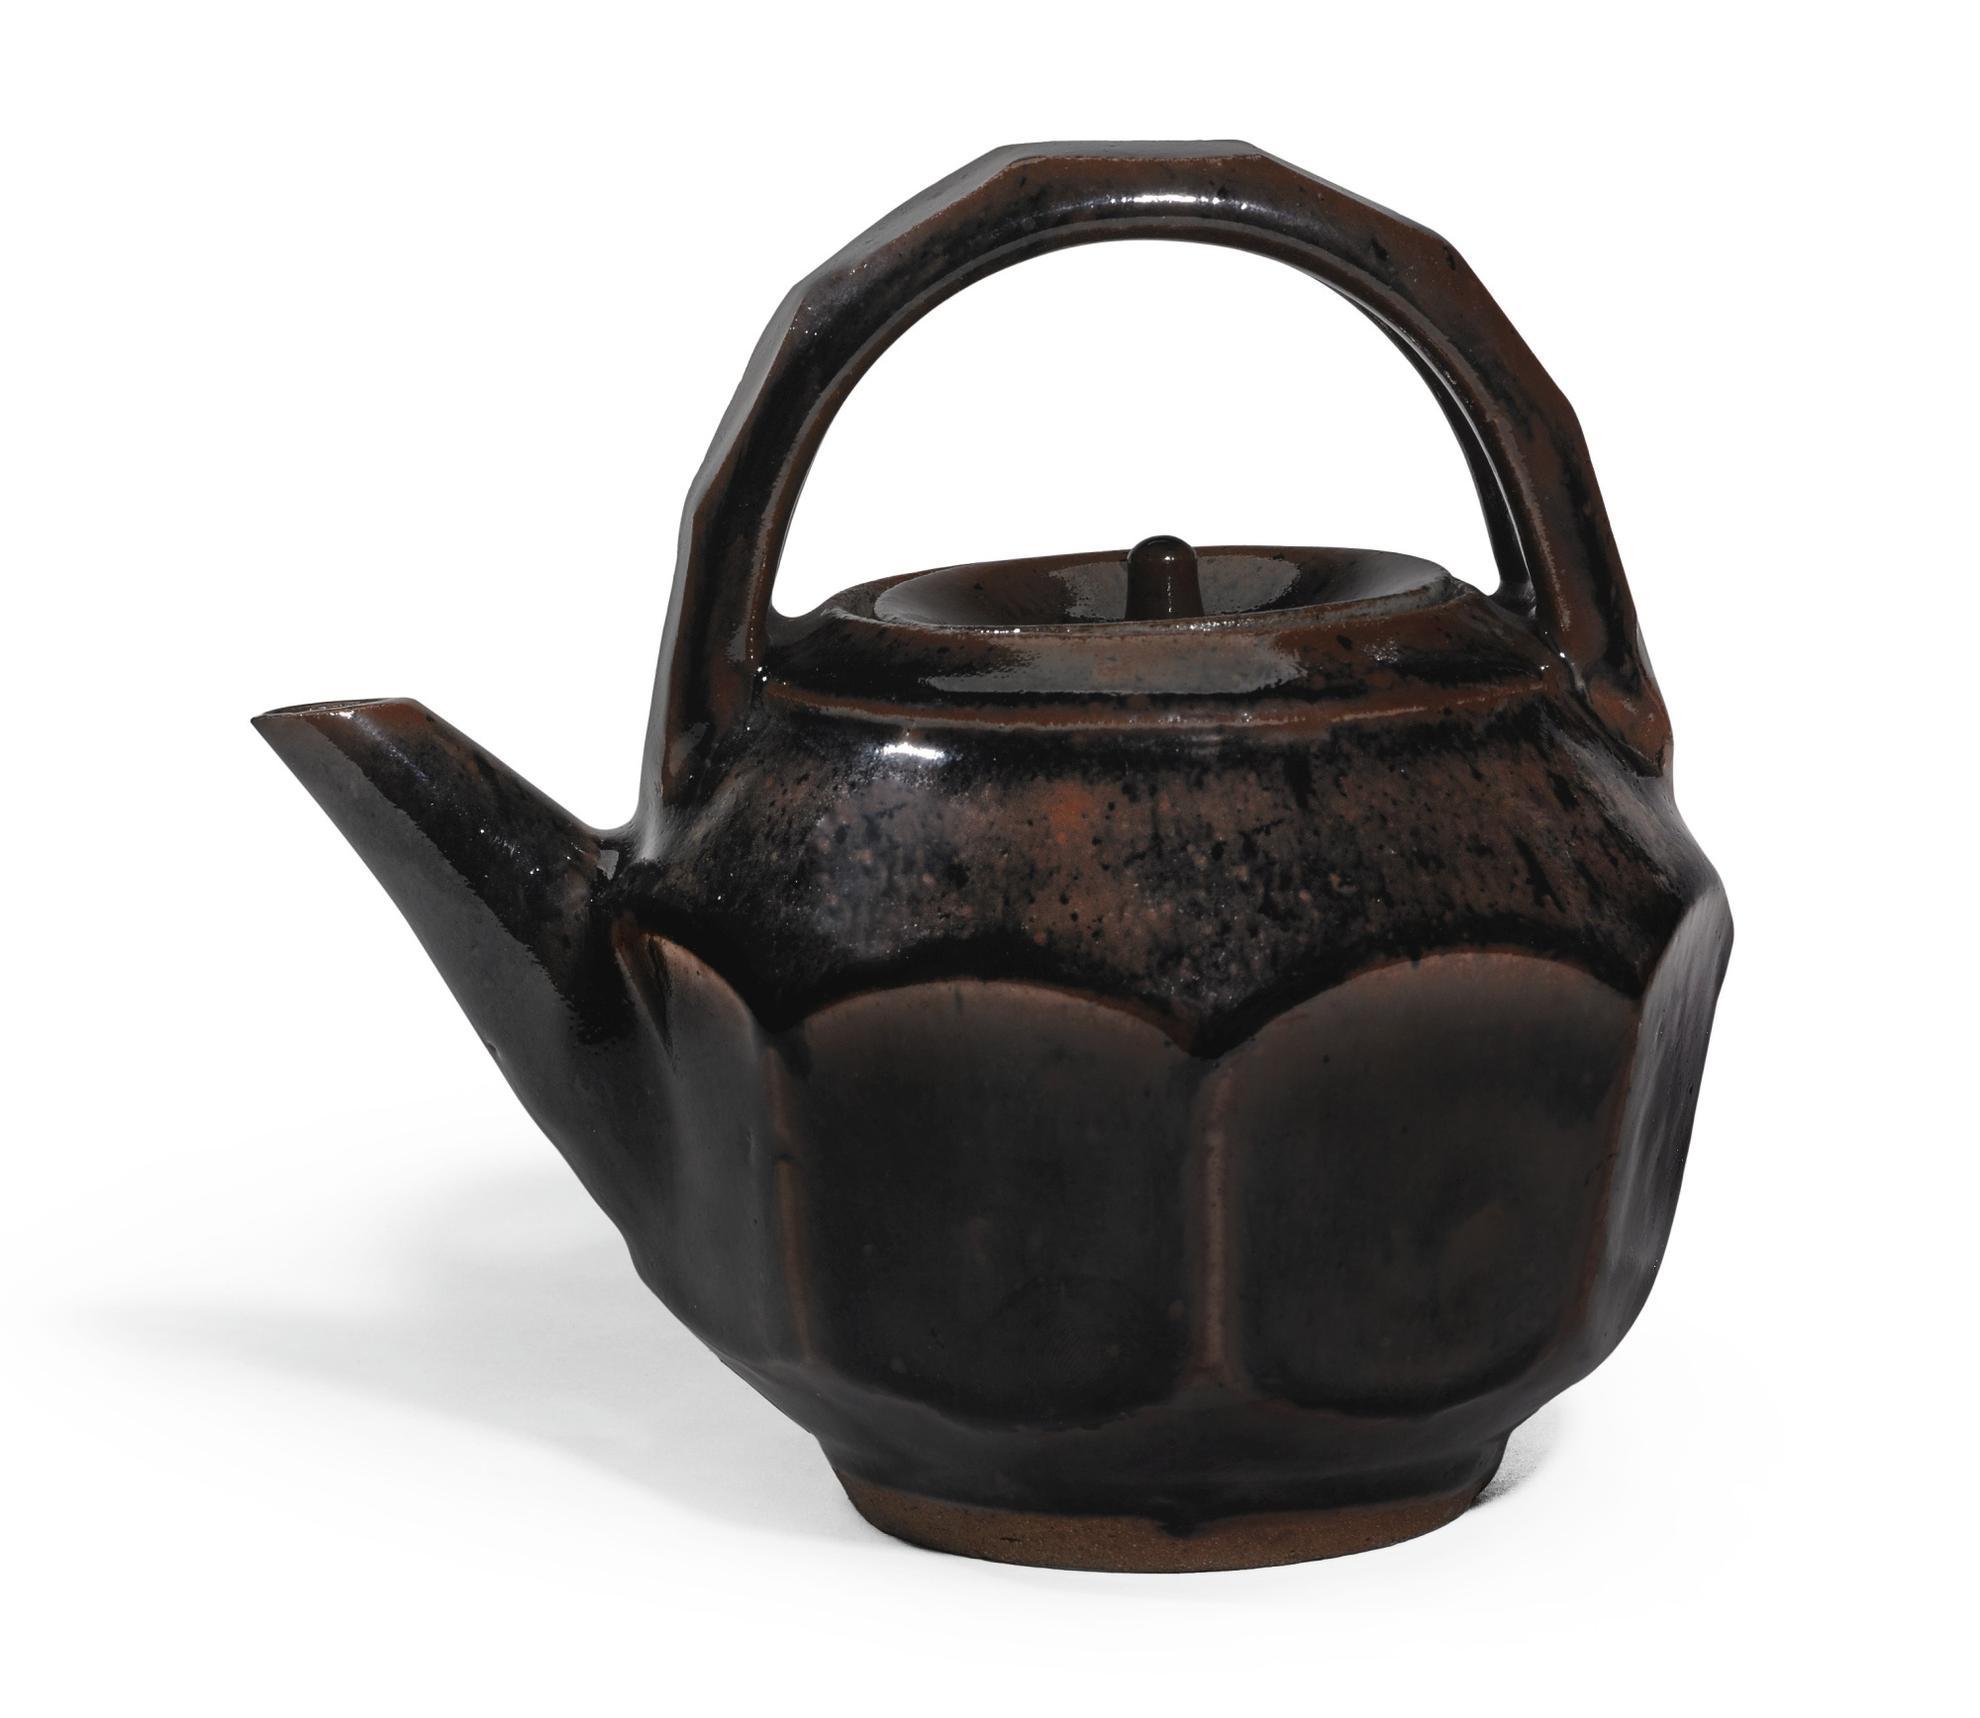 Shoji Hamada-Teapot-